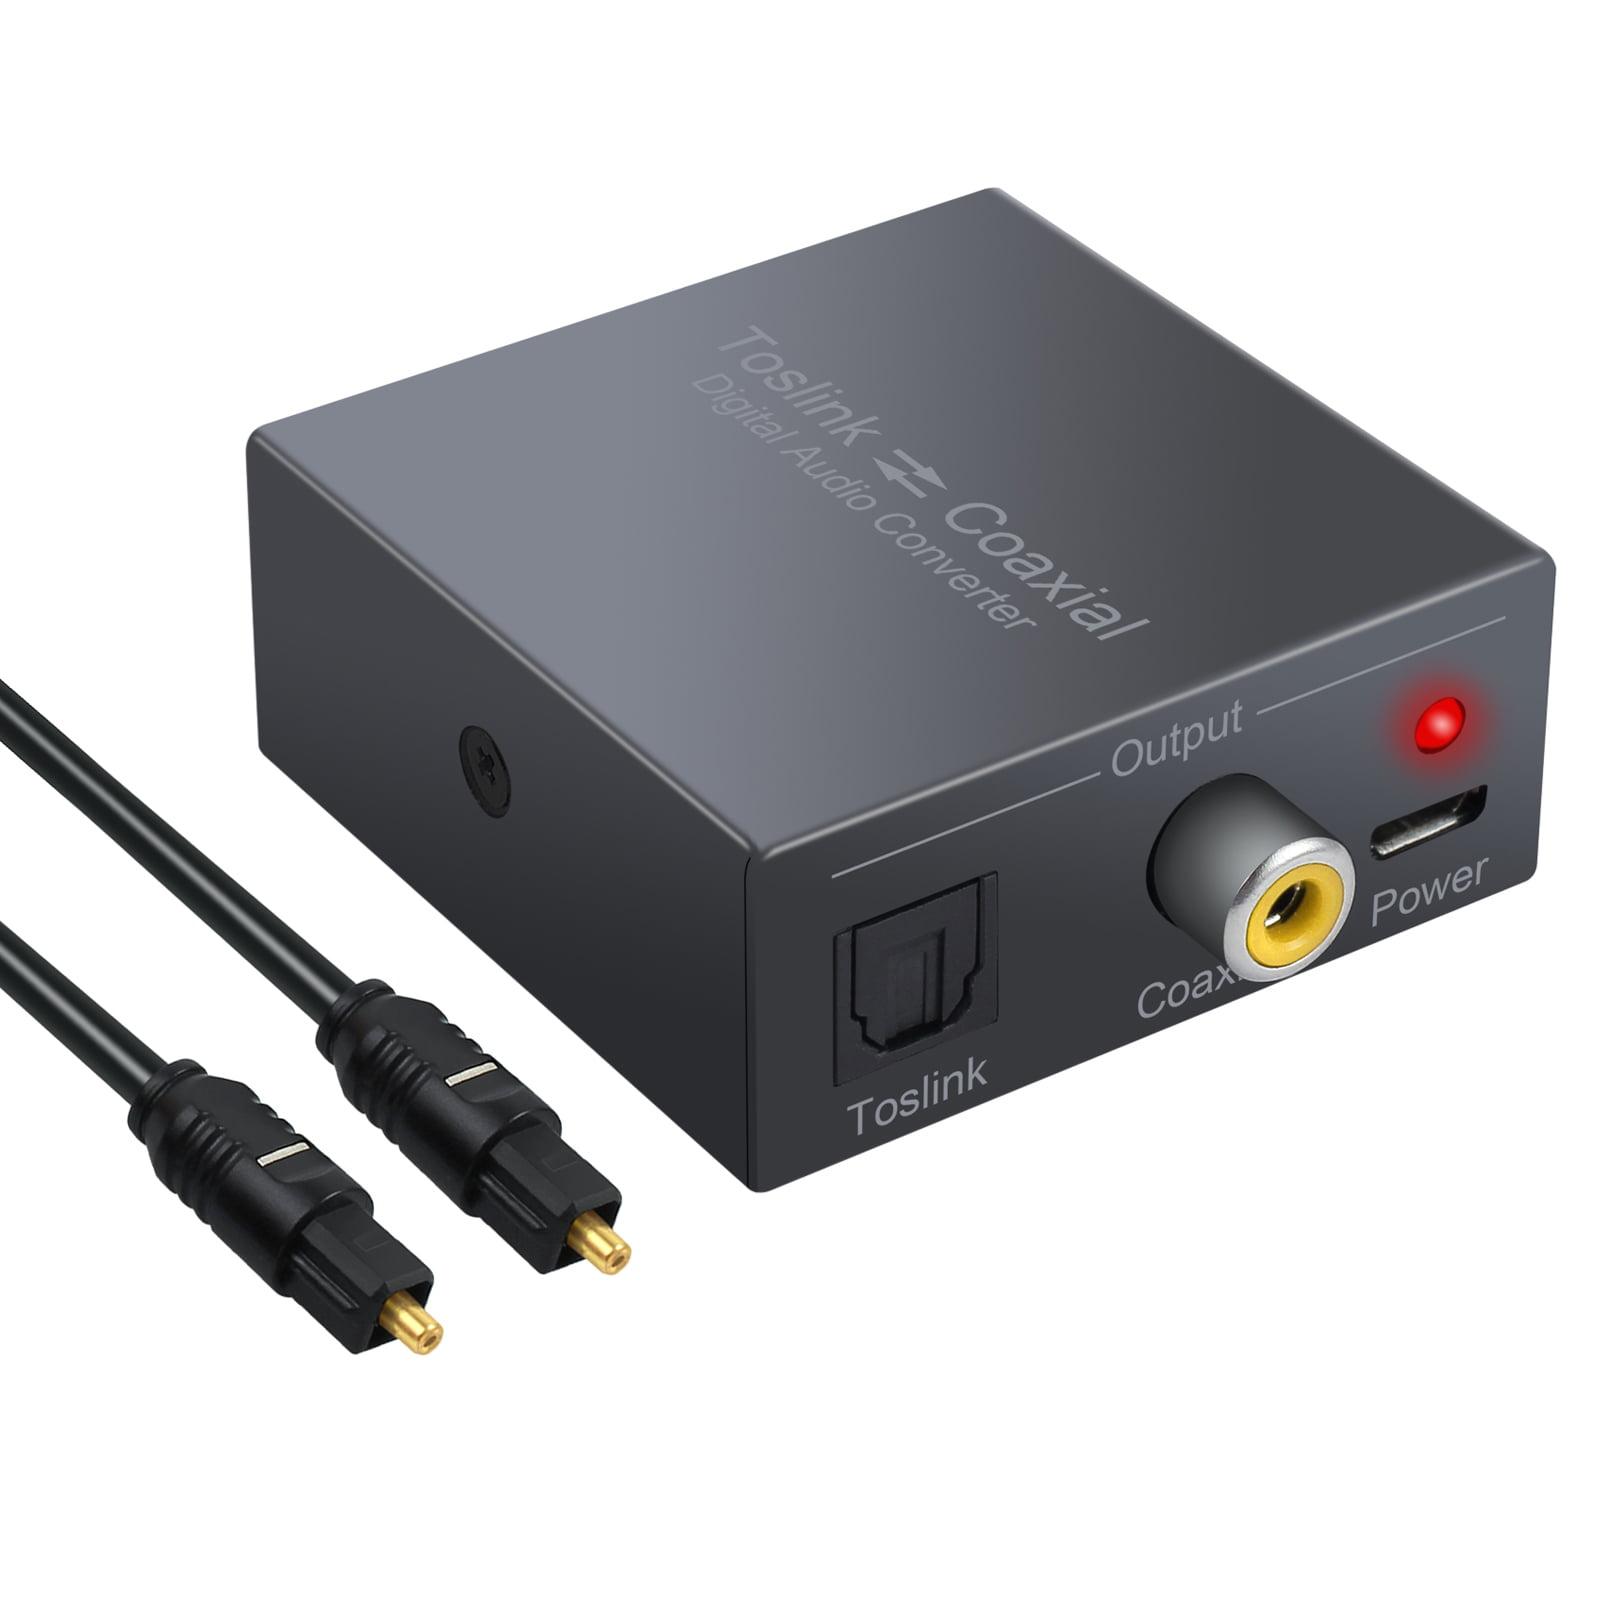 ESYNIC Digital Audio Converter Optical SPDIF Toslink to Coaxial and Coaxial to Optical SPDIF Toslink Bi-derectional Swither SPDIF Coaxial and Toslink Optical Splitter